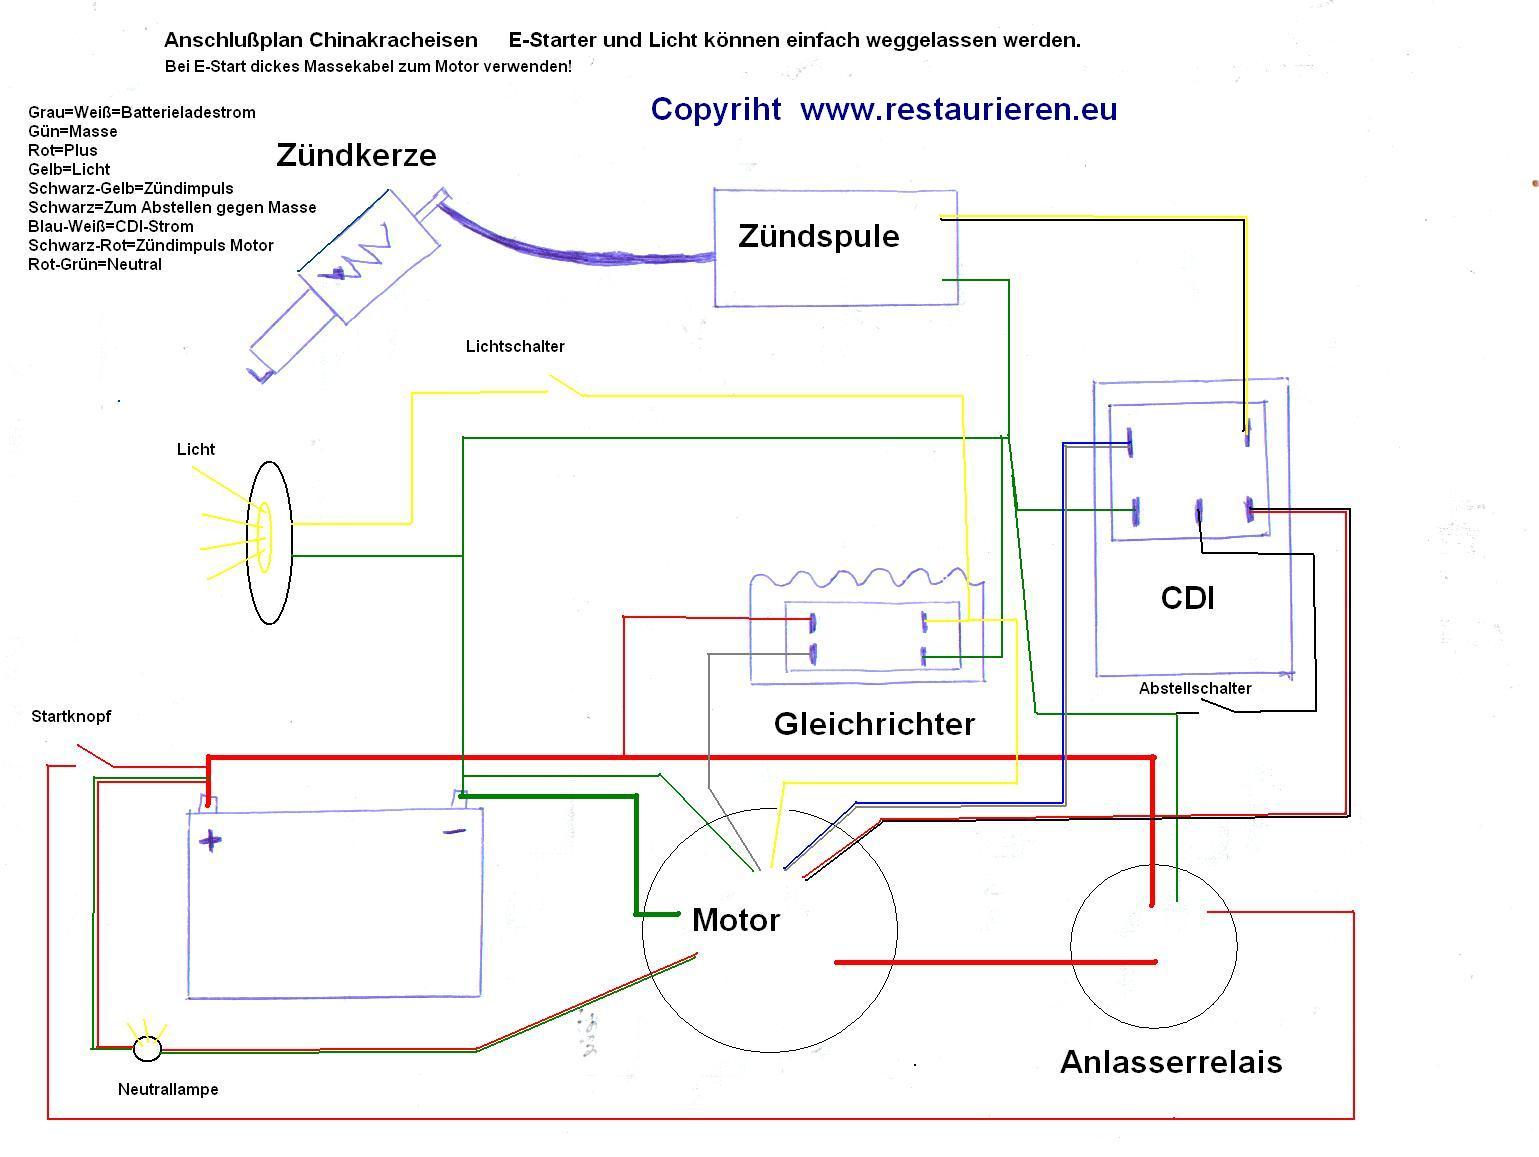 Niedlich Lifan Schaltplan Ideen - Schaltplan Serie Circuit ...